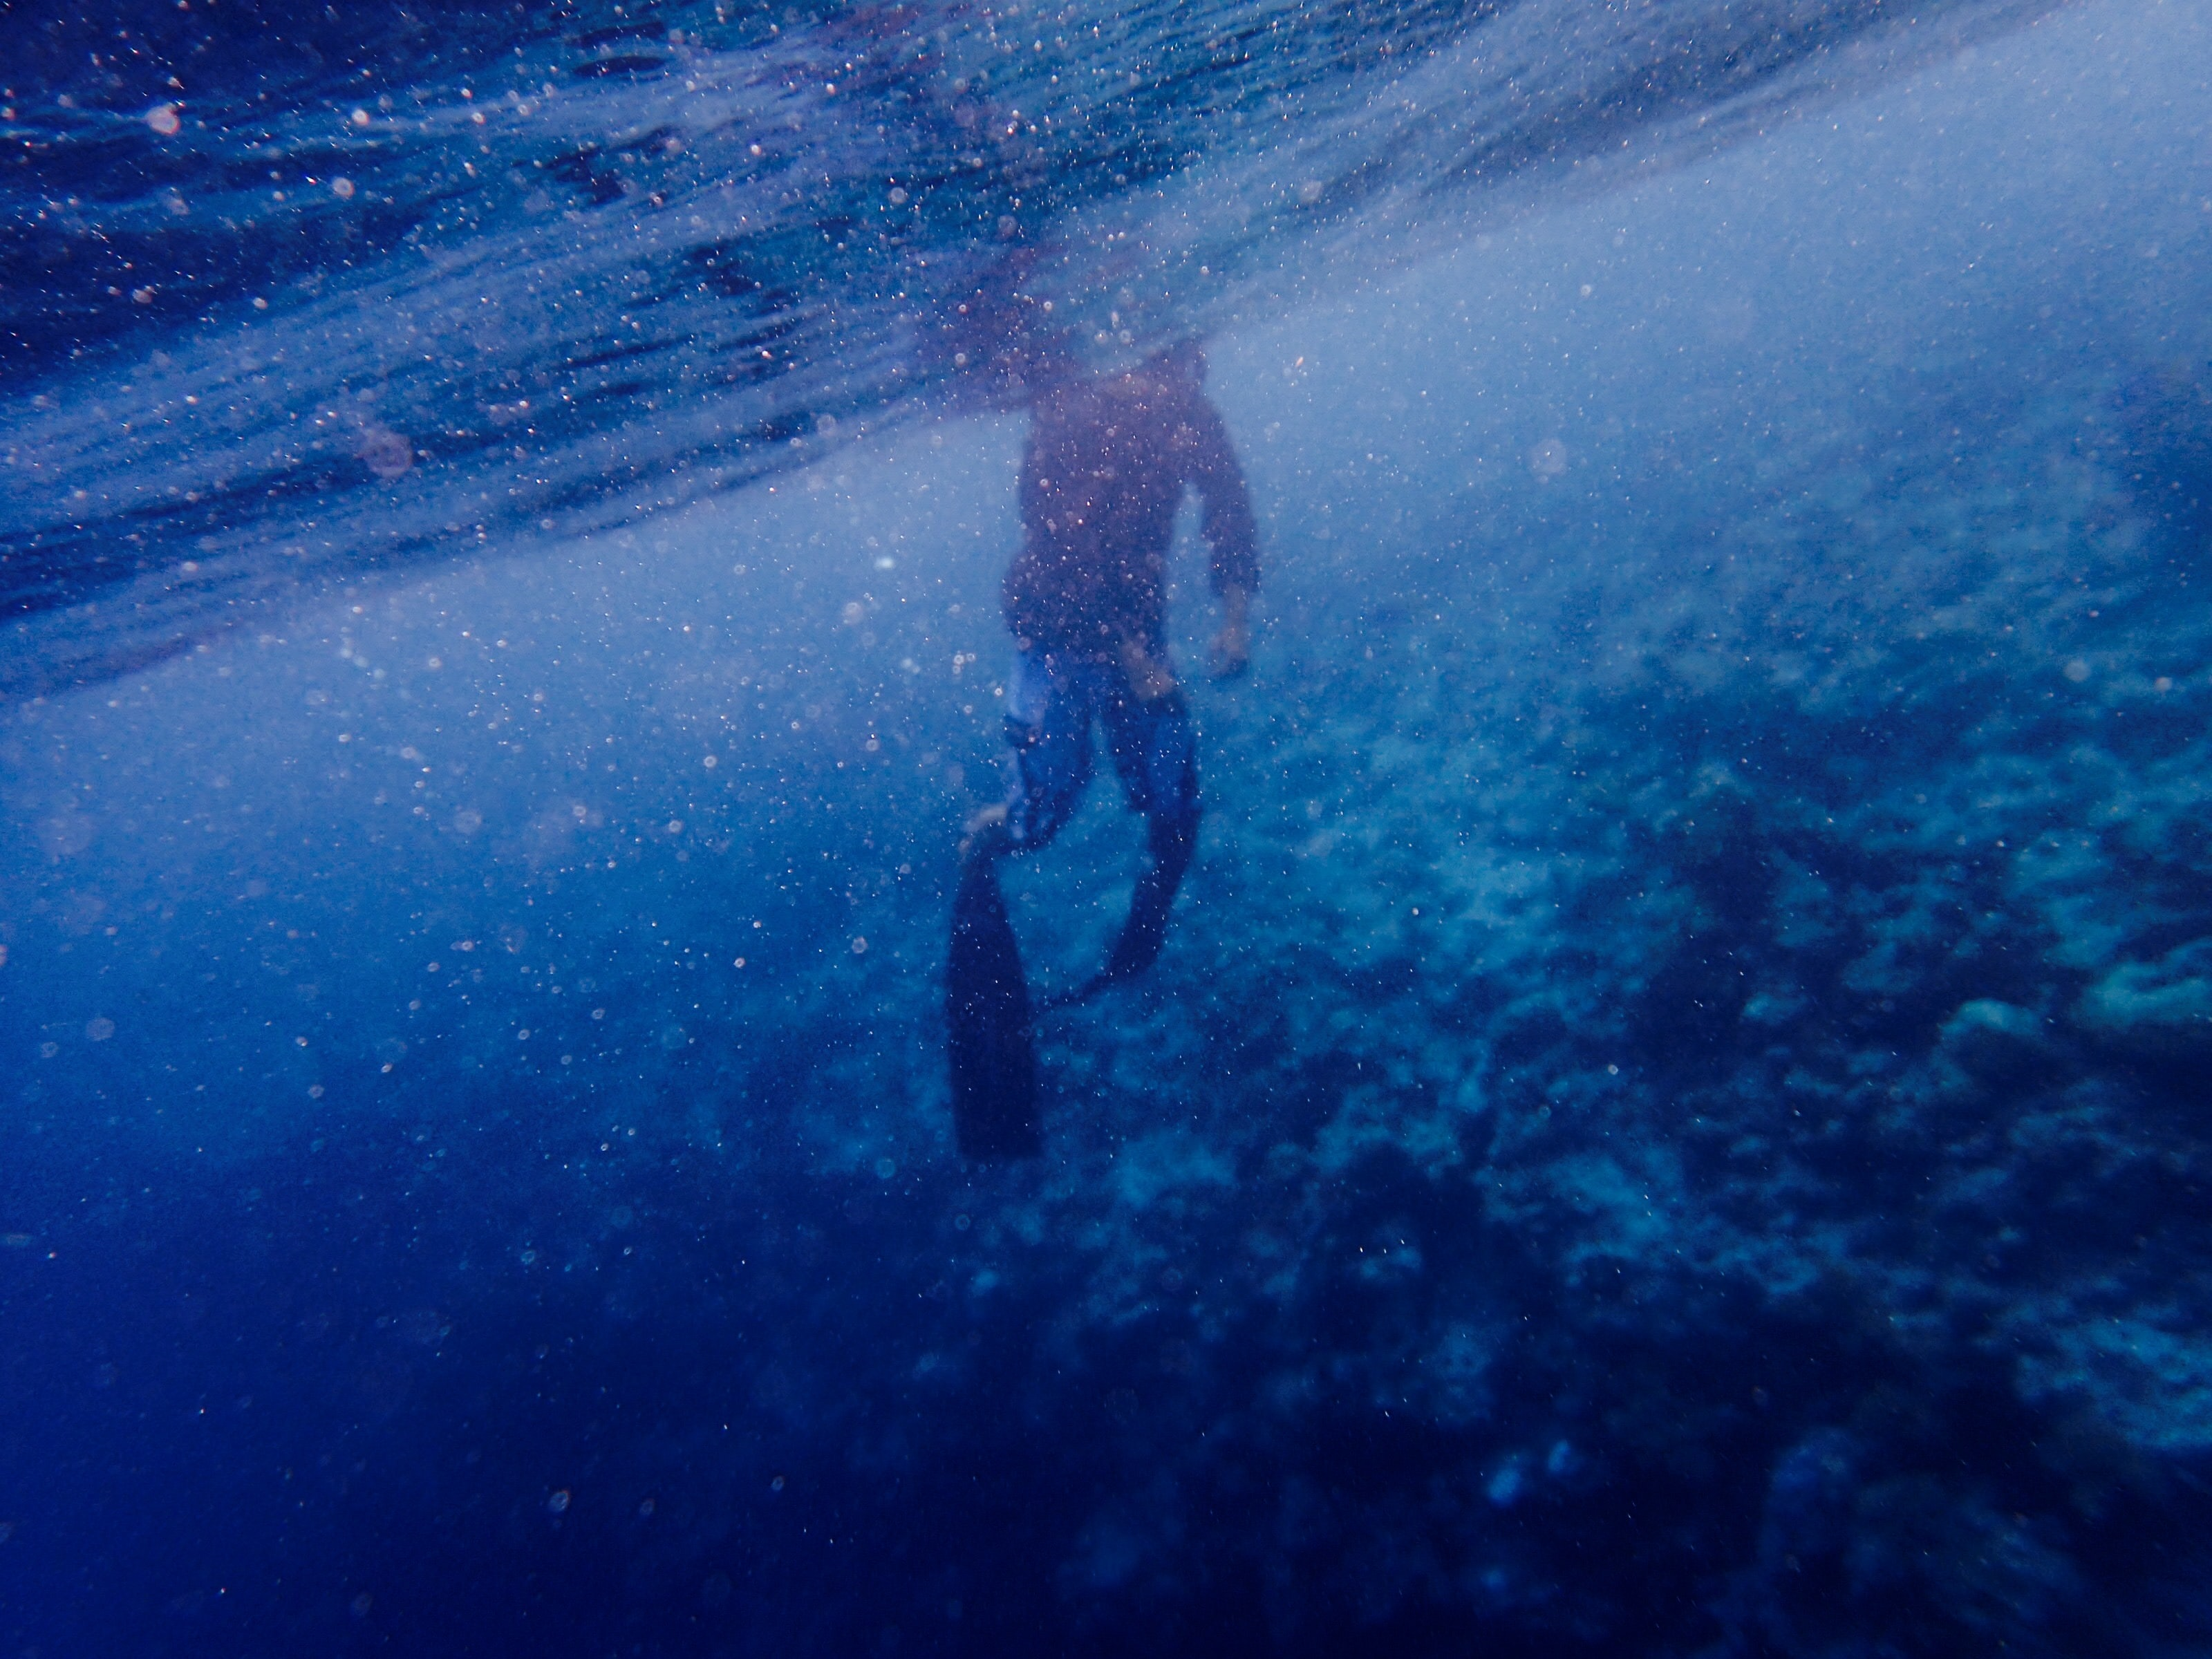 A diver underwater in the deep blue ocean.